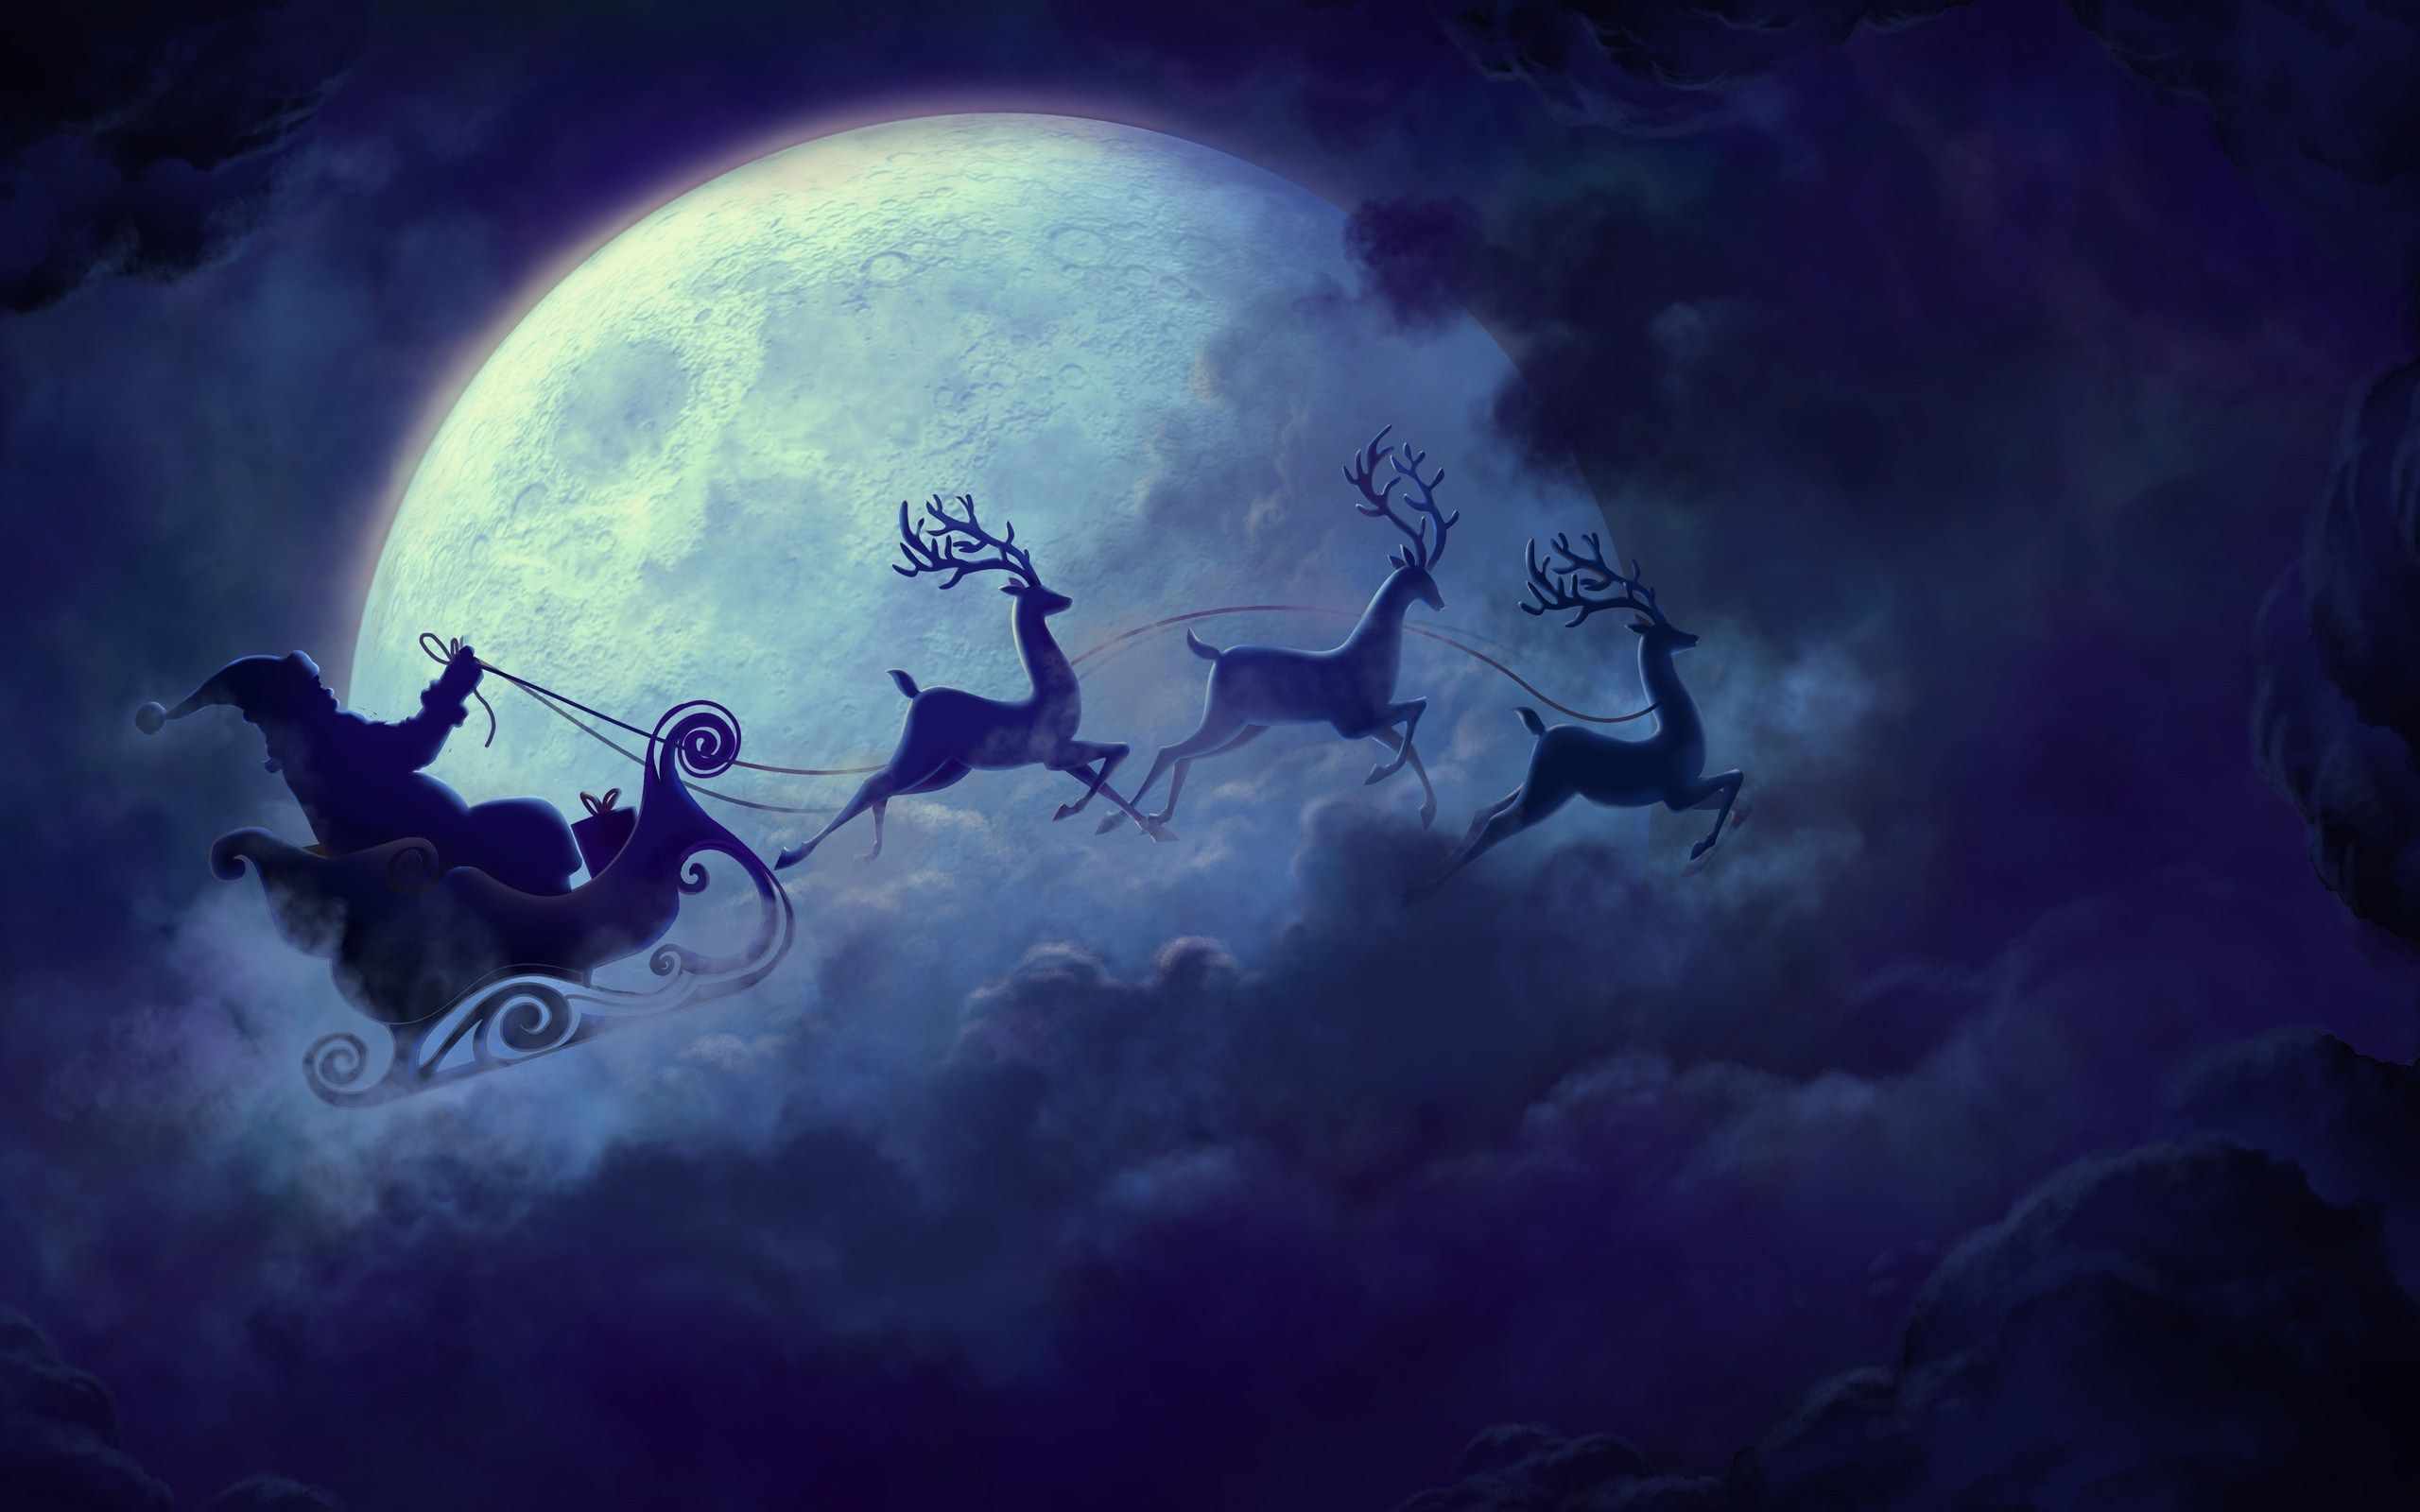 Santa Claus Christmas Wallpaper Santa Claus Wallpaper Christmas Wallpaper Backgrounds